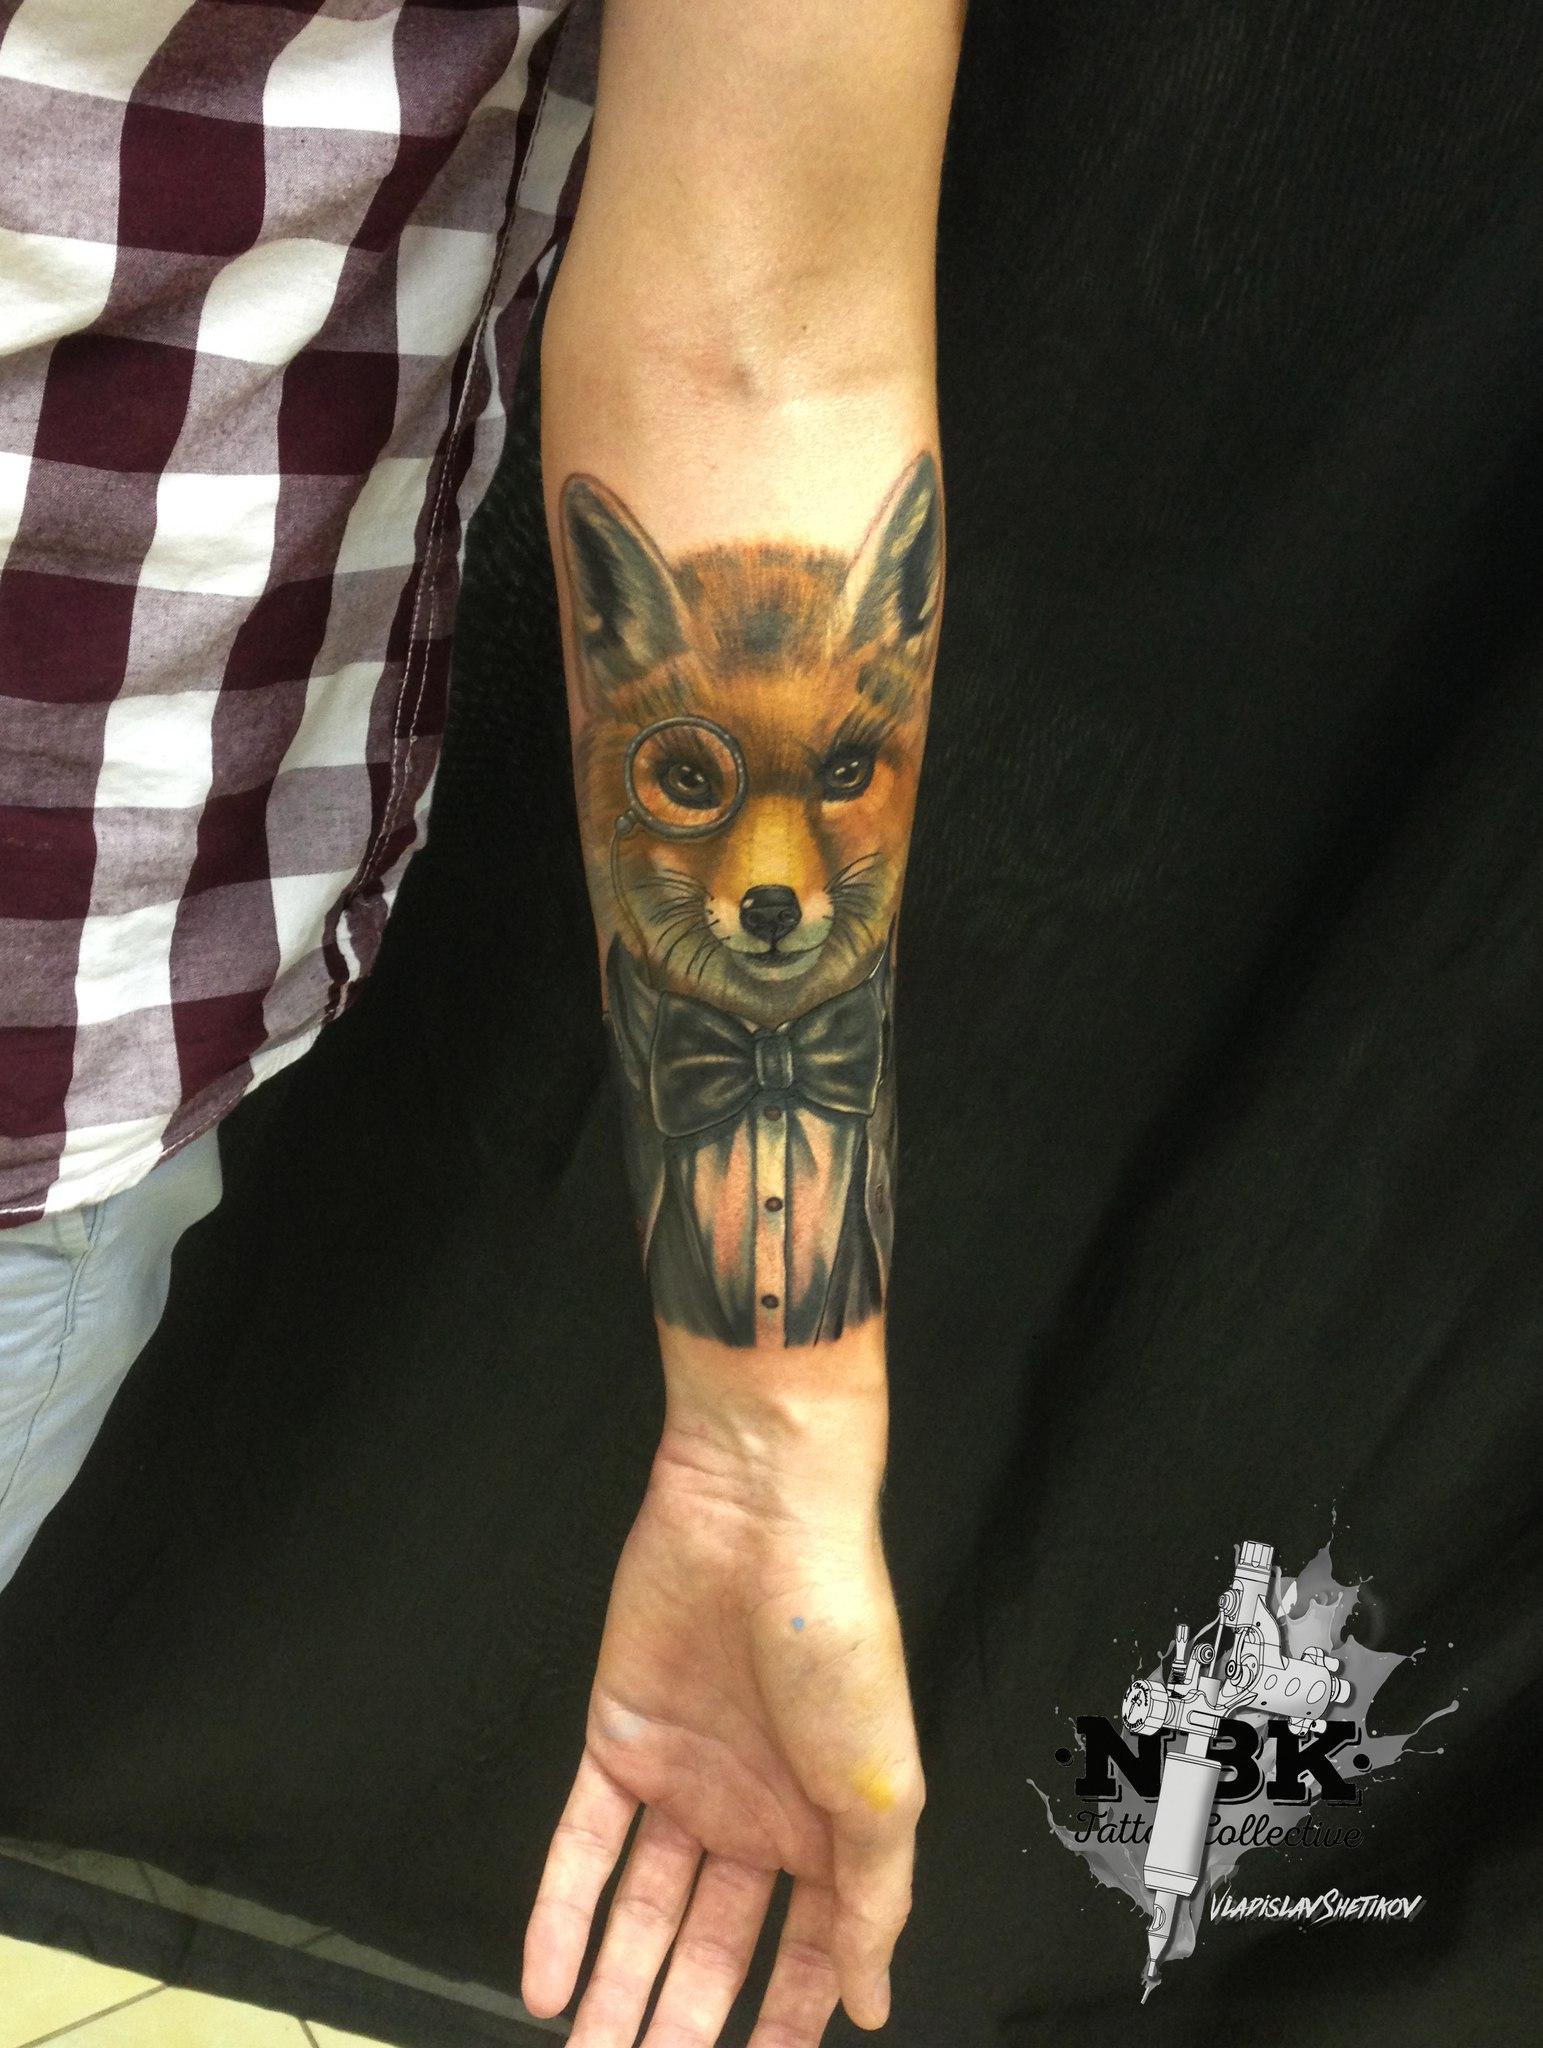 Stylish fox with eyeglasses tattoo on forearm